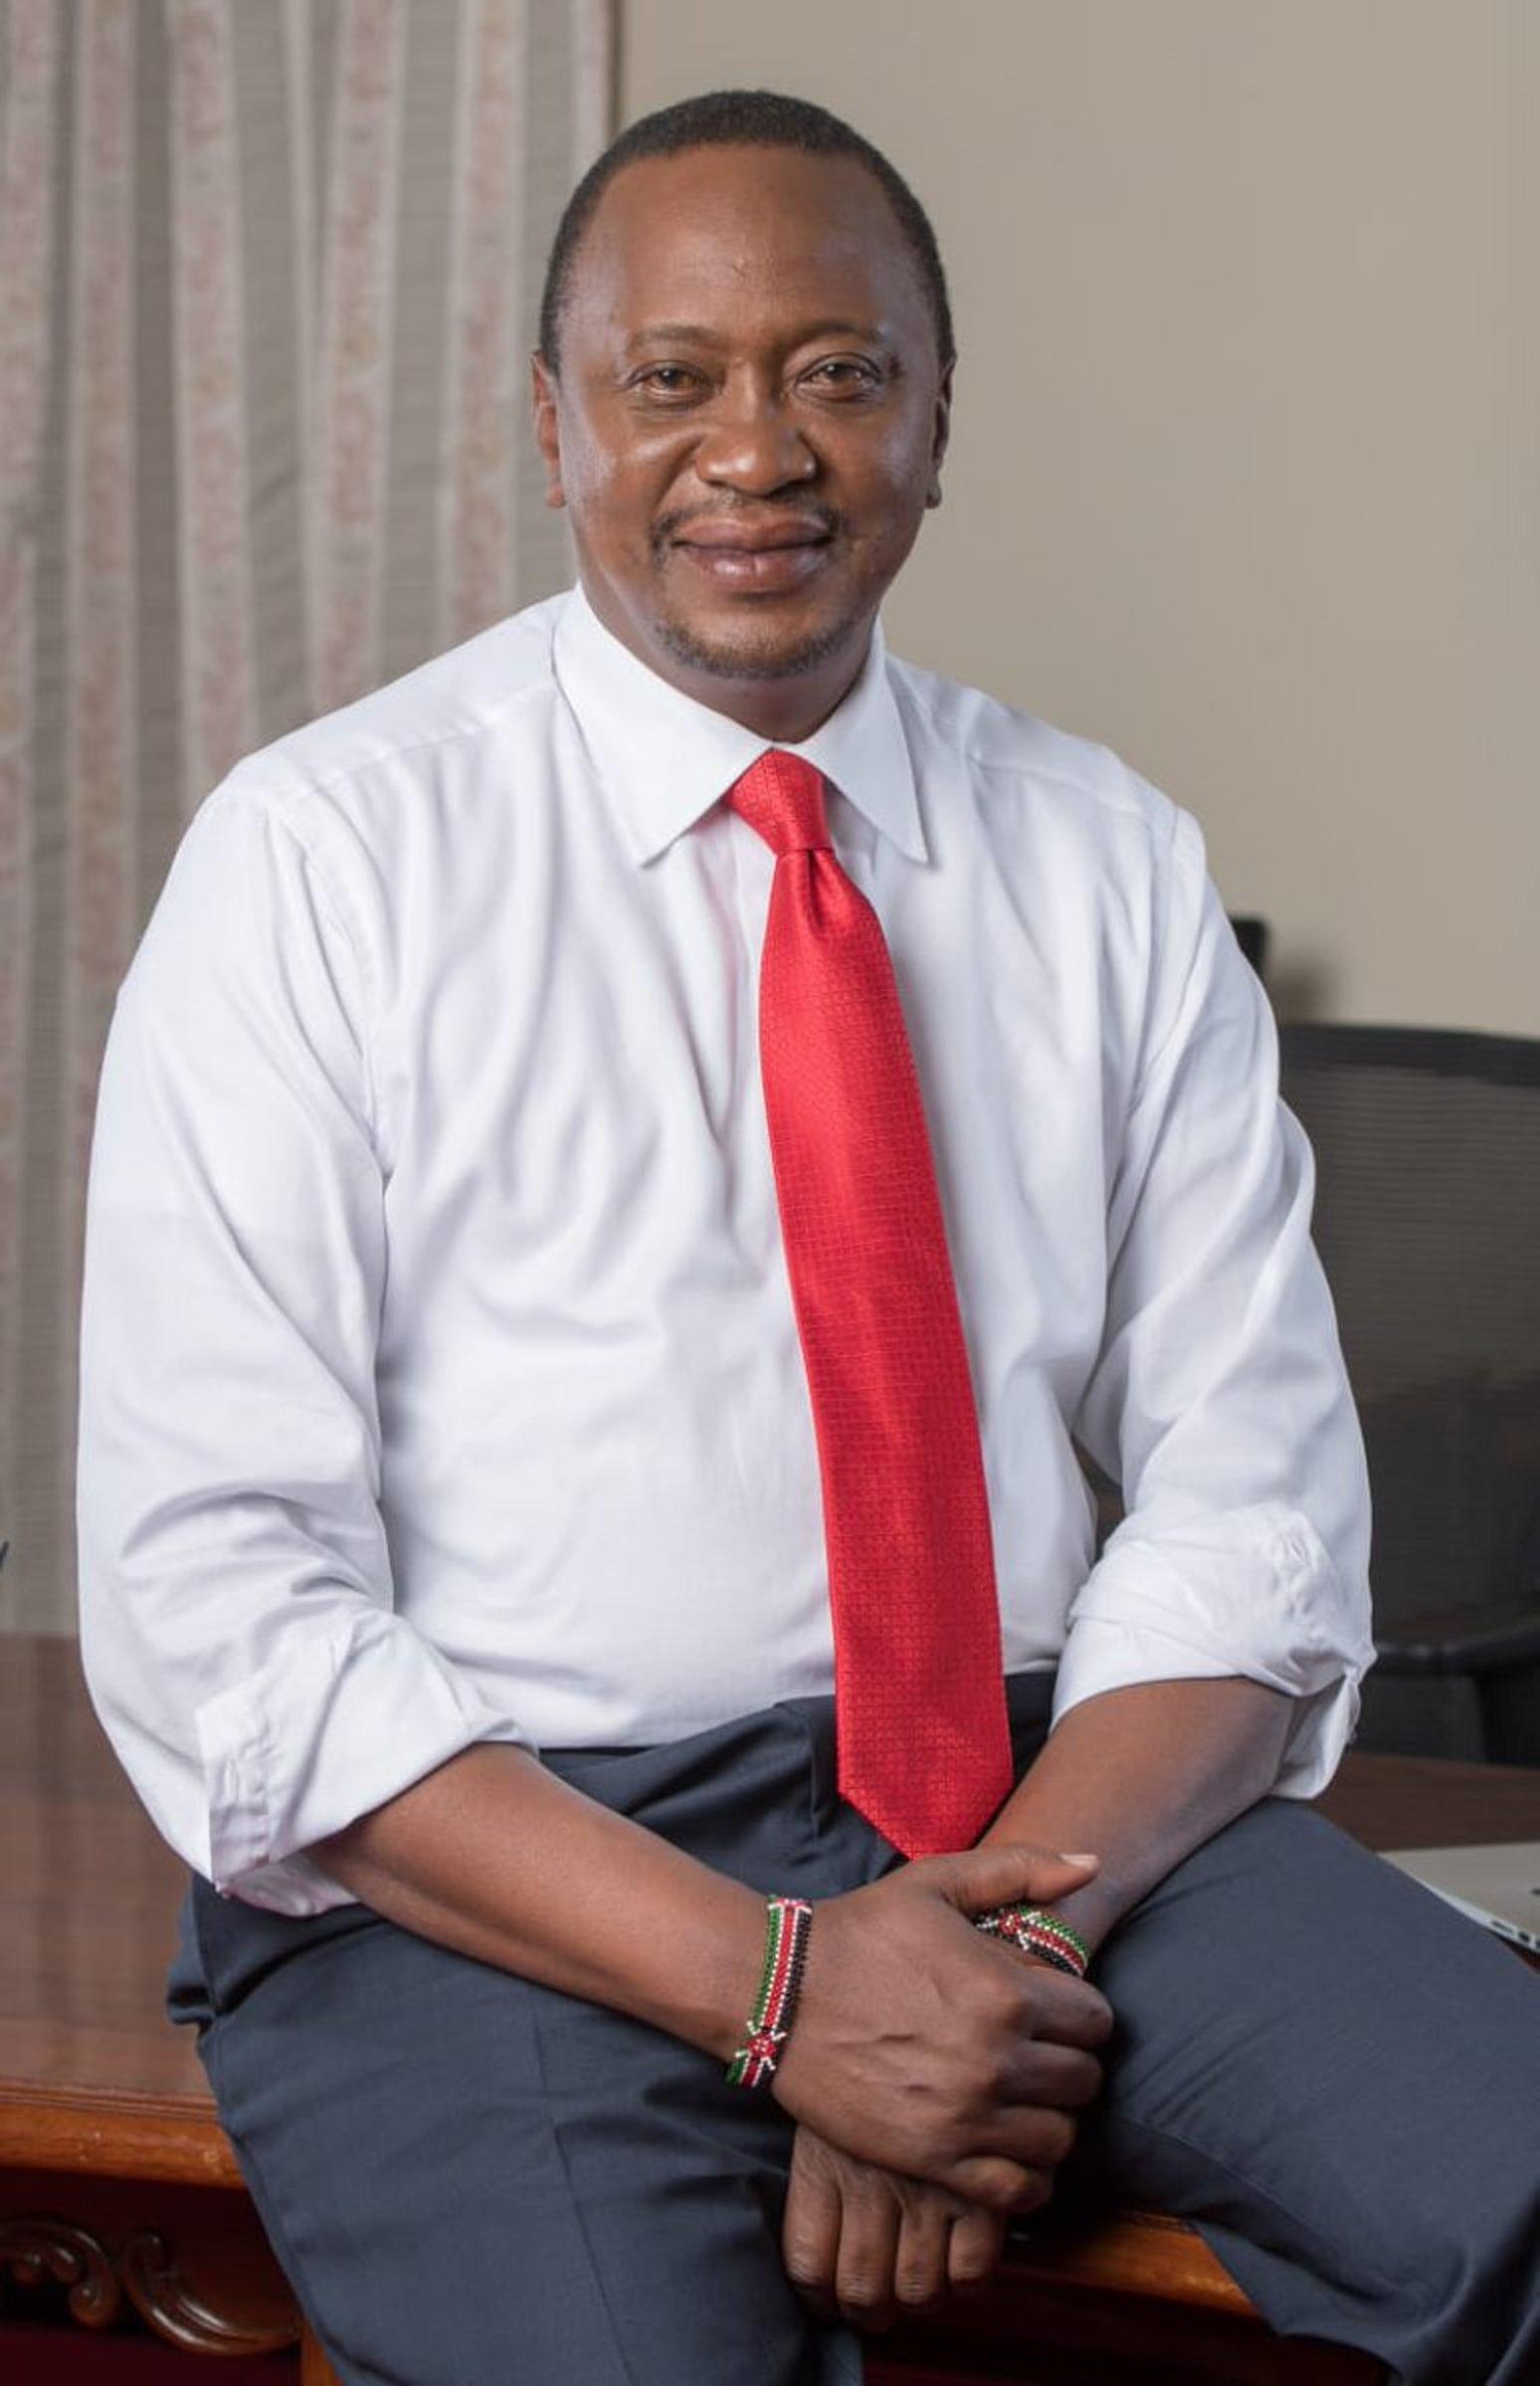 Kenyatta to grace this year's Imbalu fete – PML Daily